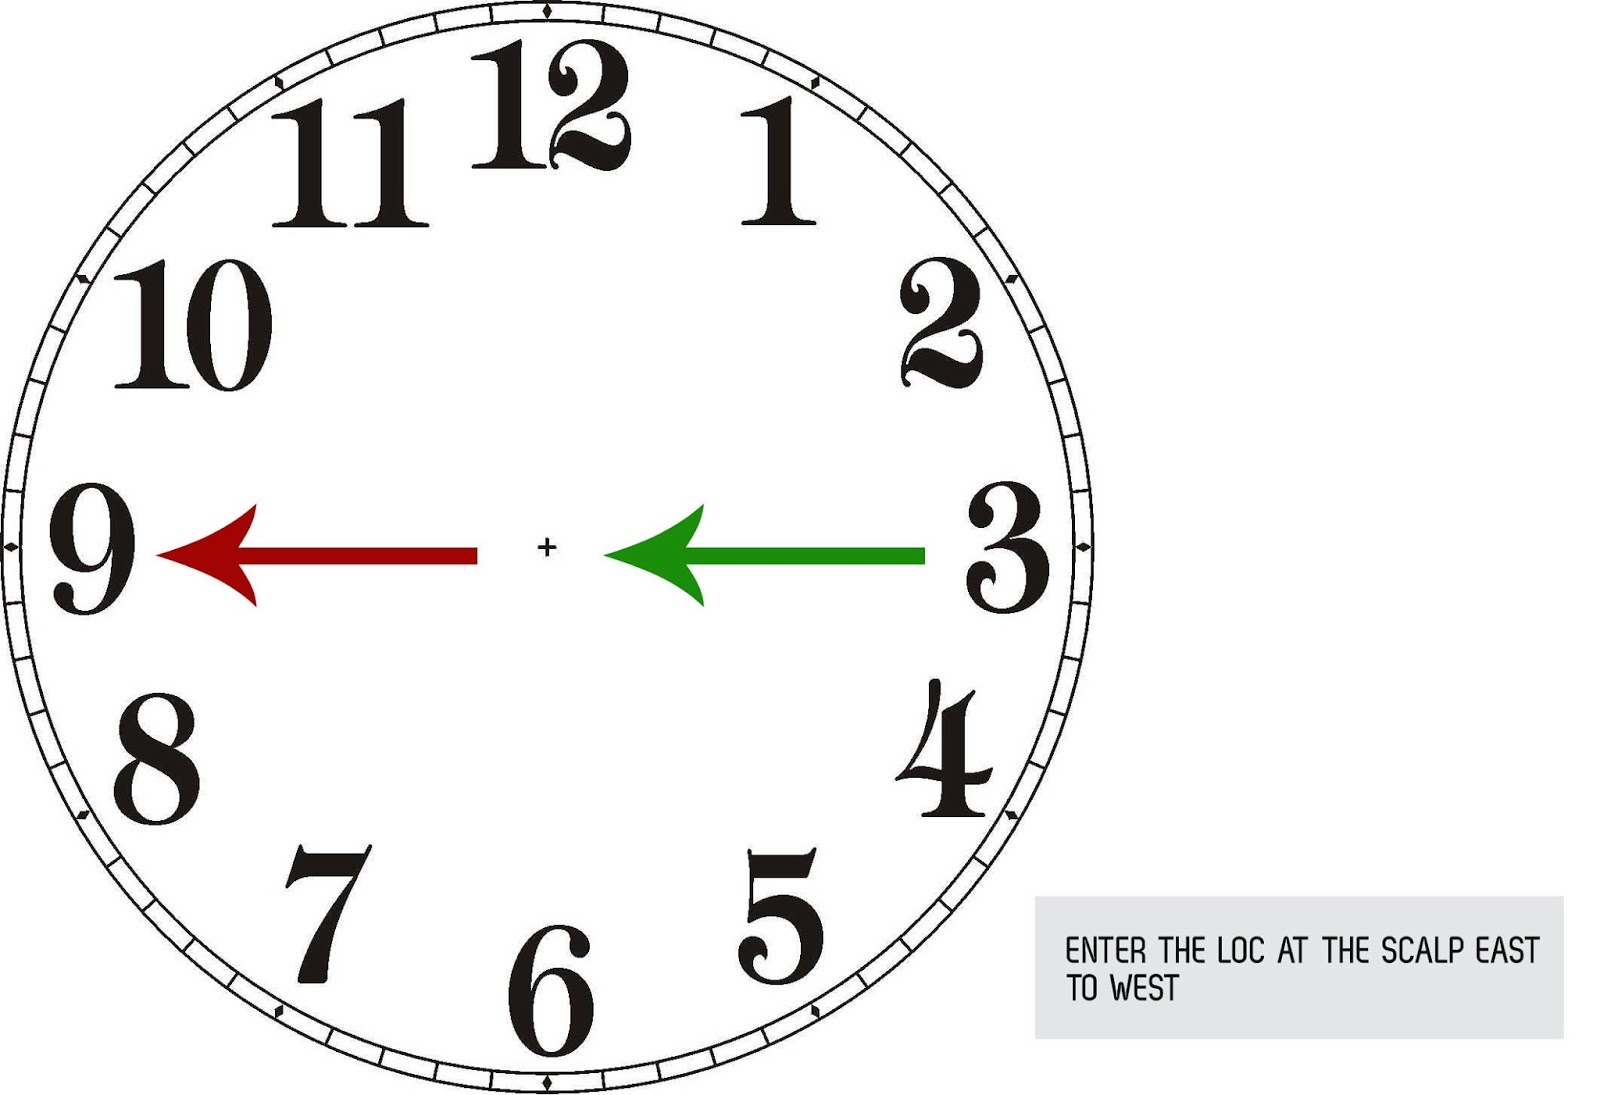 diagram of a clock wiring diagram descriptionkreyola u0027s journeys how to interlocking patterns with clock [ 1600 x 1095 Pixel ]